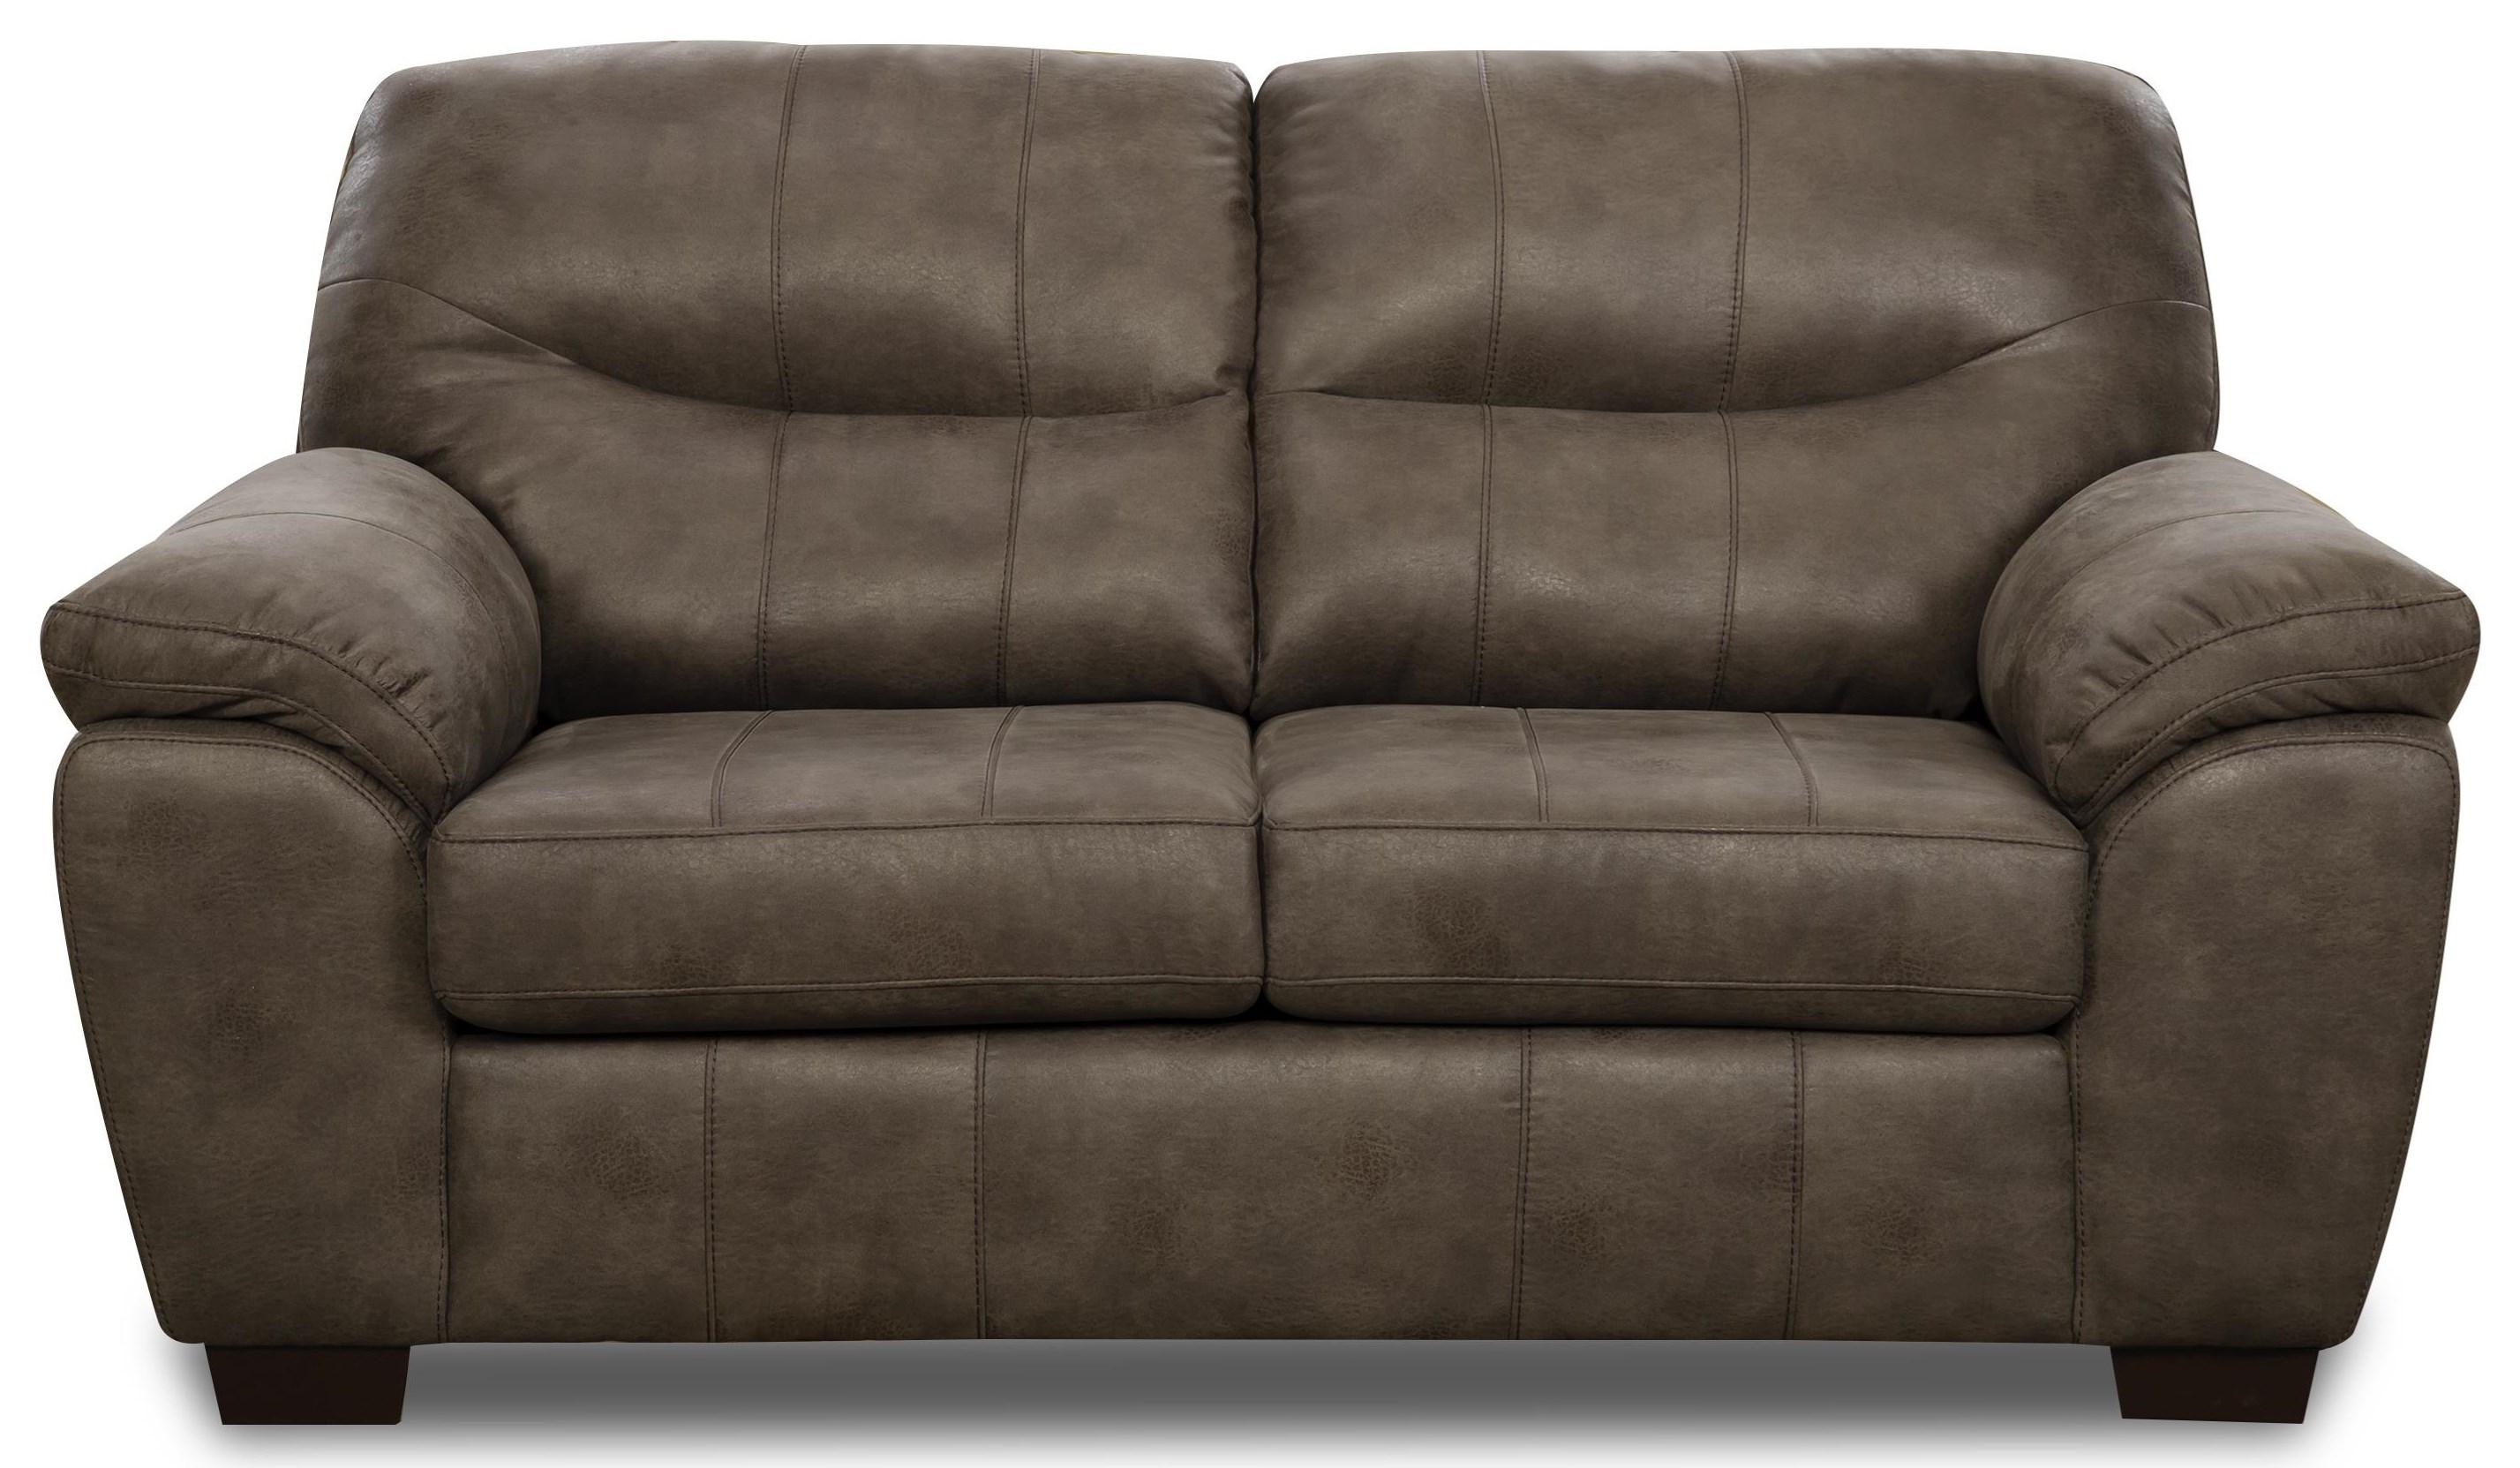 Denver Loveseat by Behold Home at Darvin Furniture